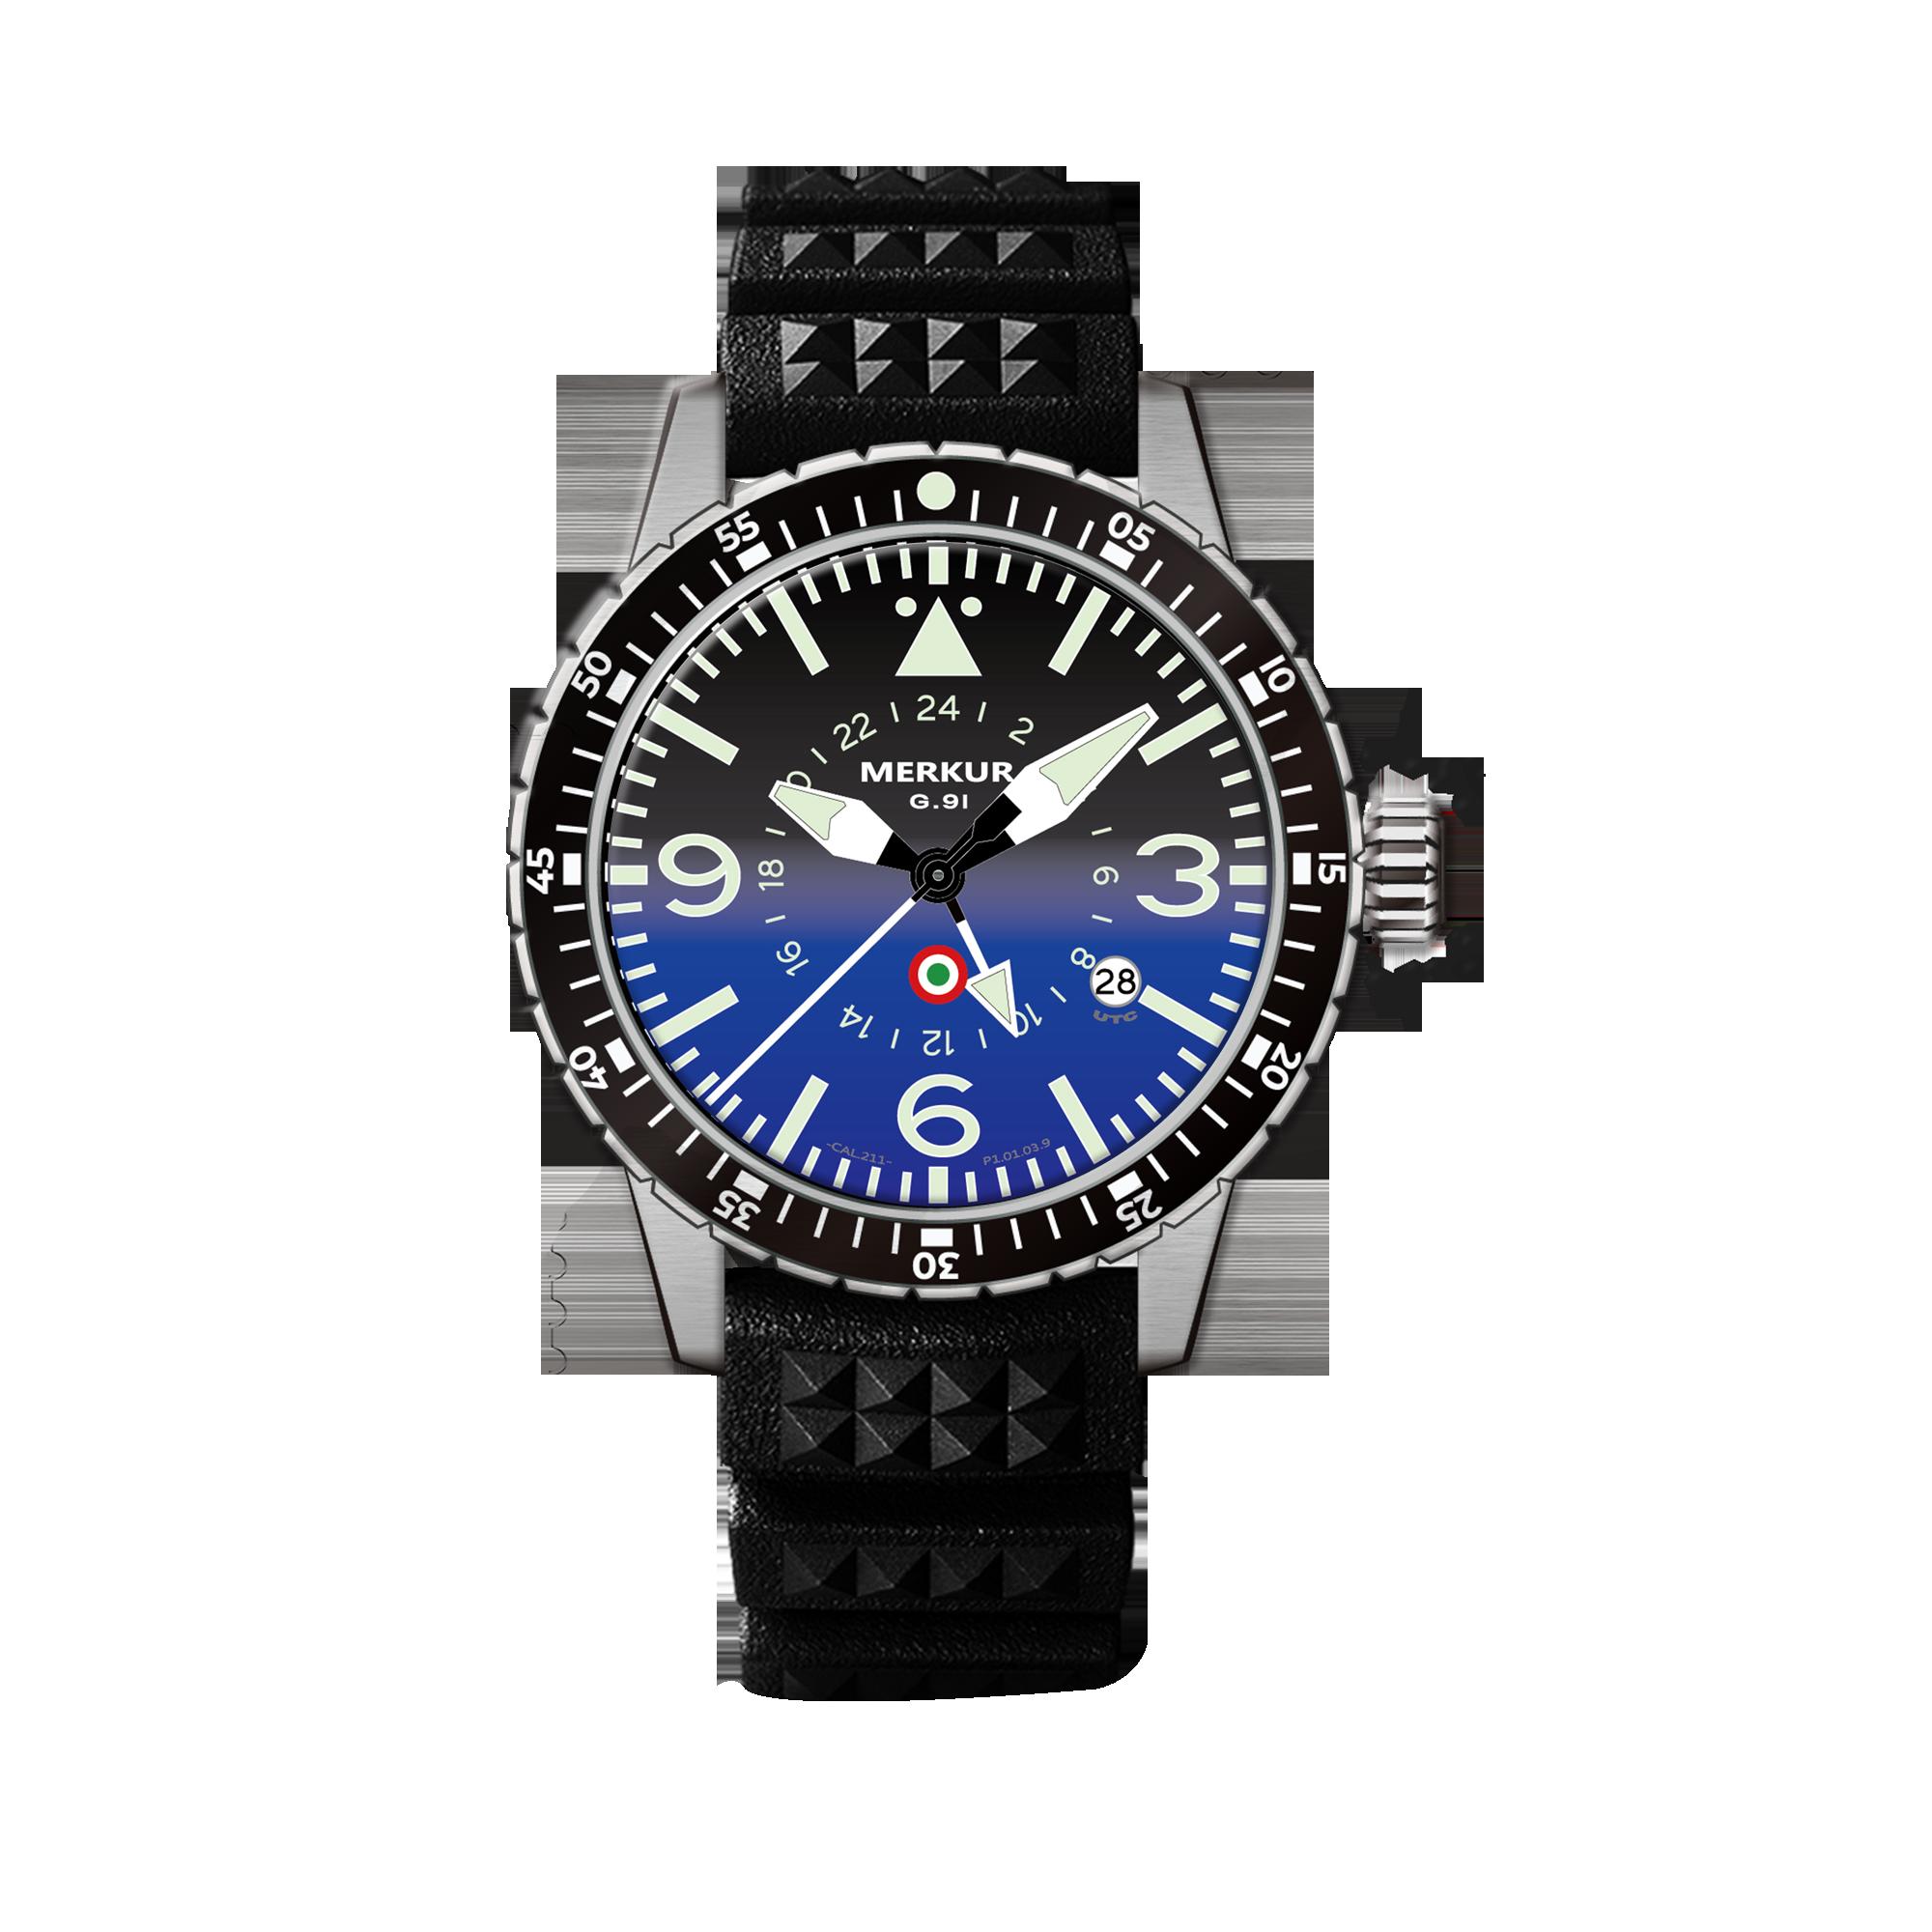 MERKUR GMT PILOT Series 100M Water Proof High Beat Automatic Sapphire Ceramic Bezel Men's Diver Spor